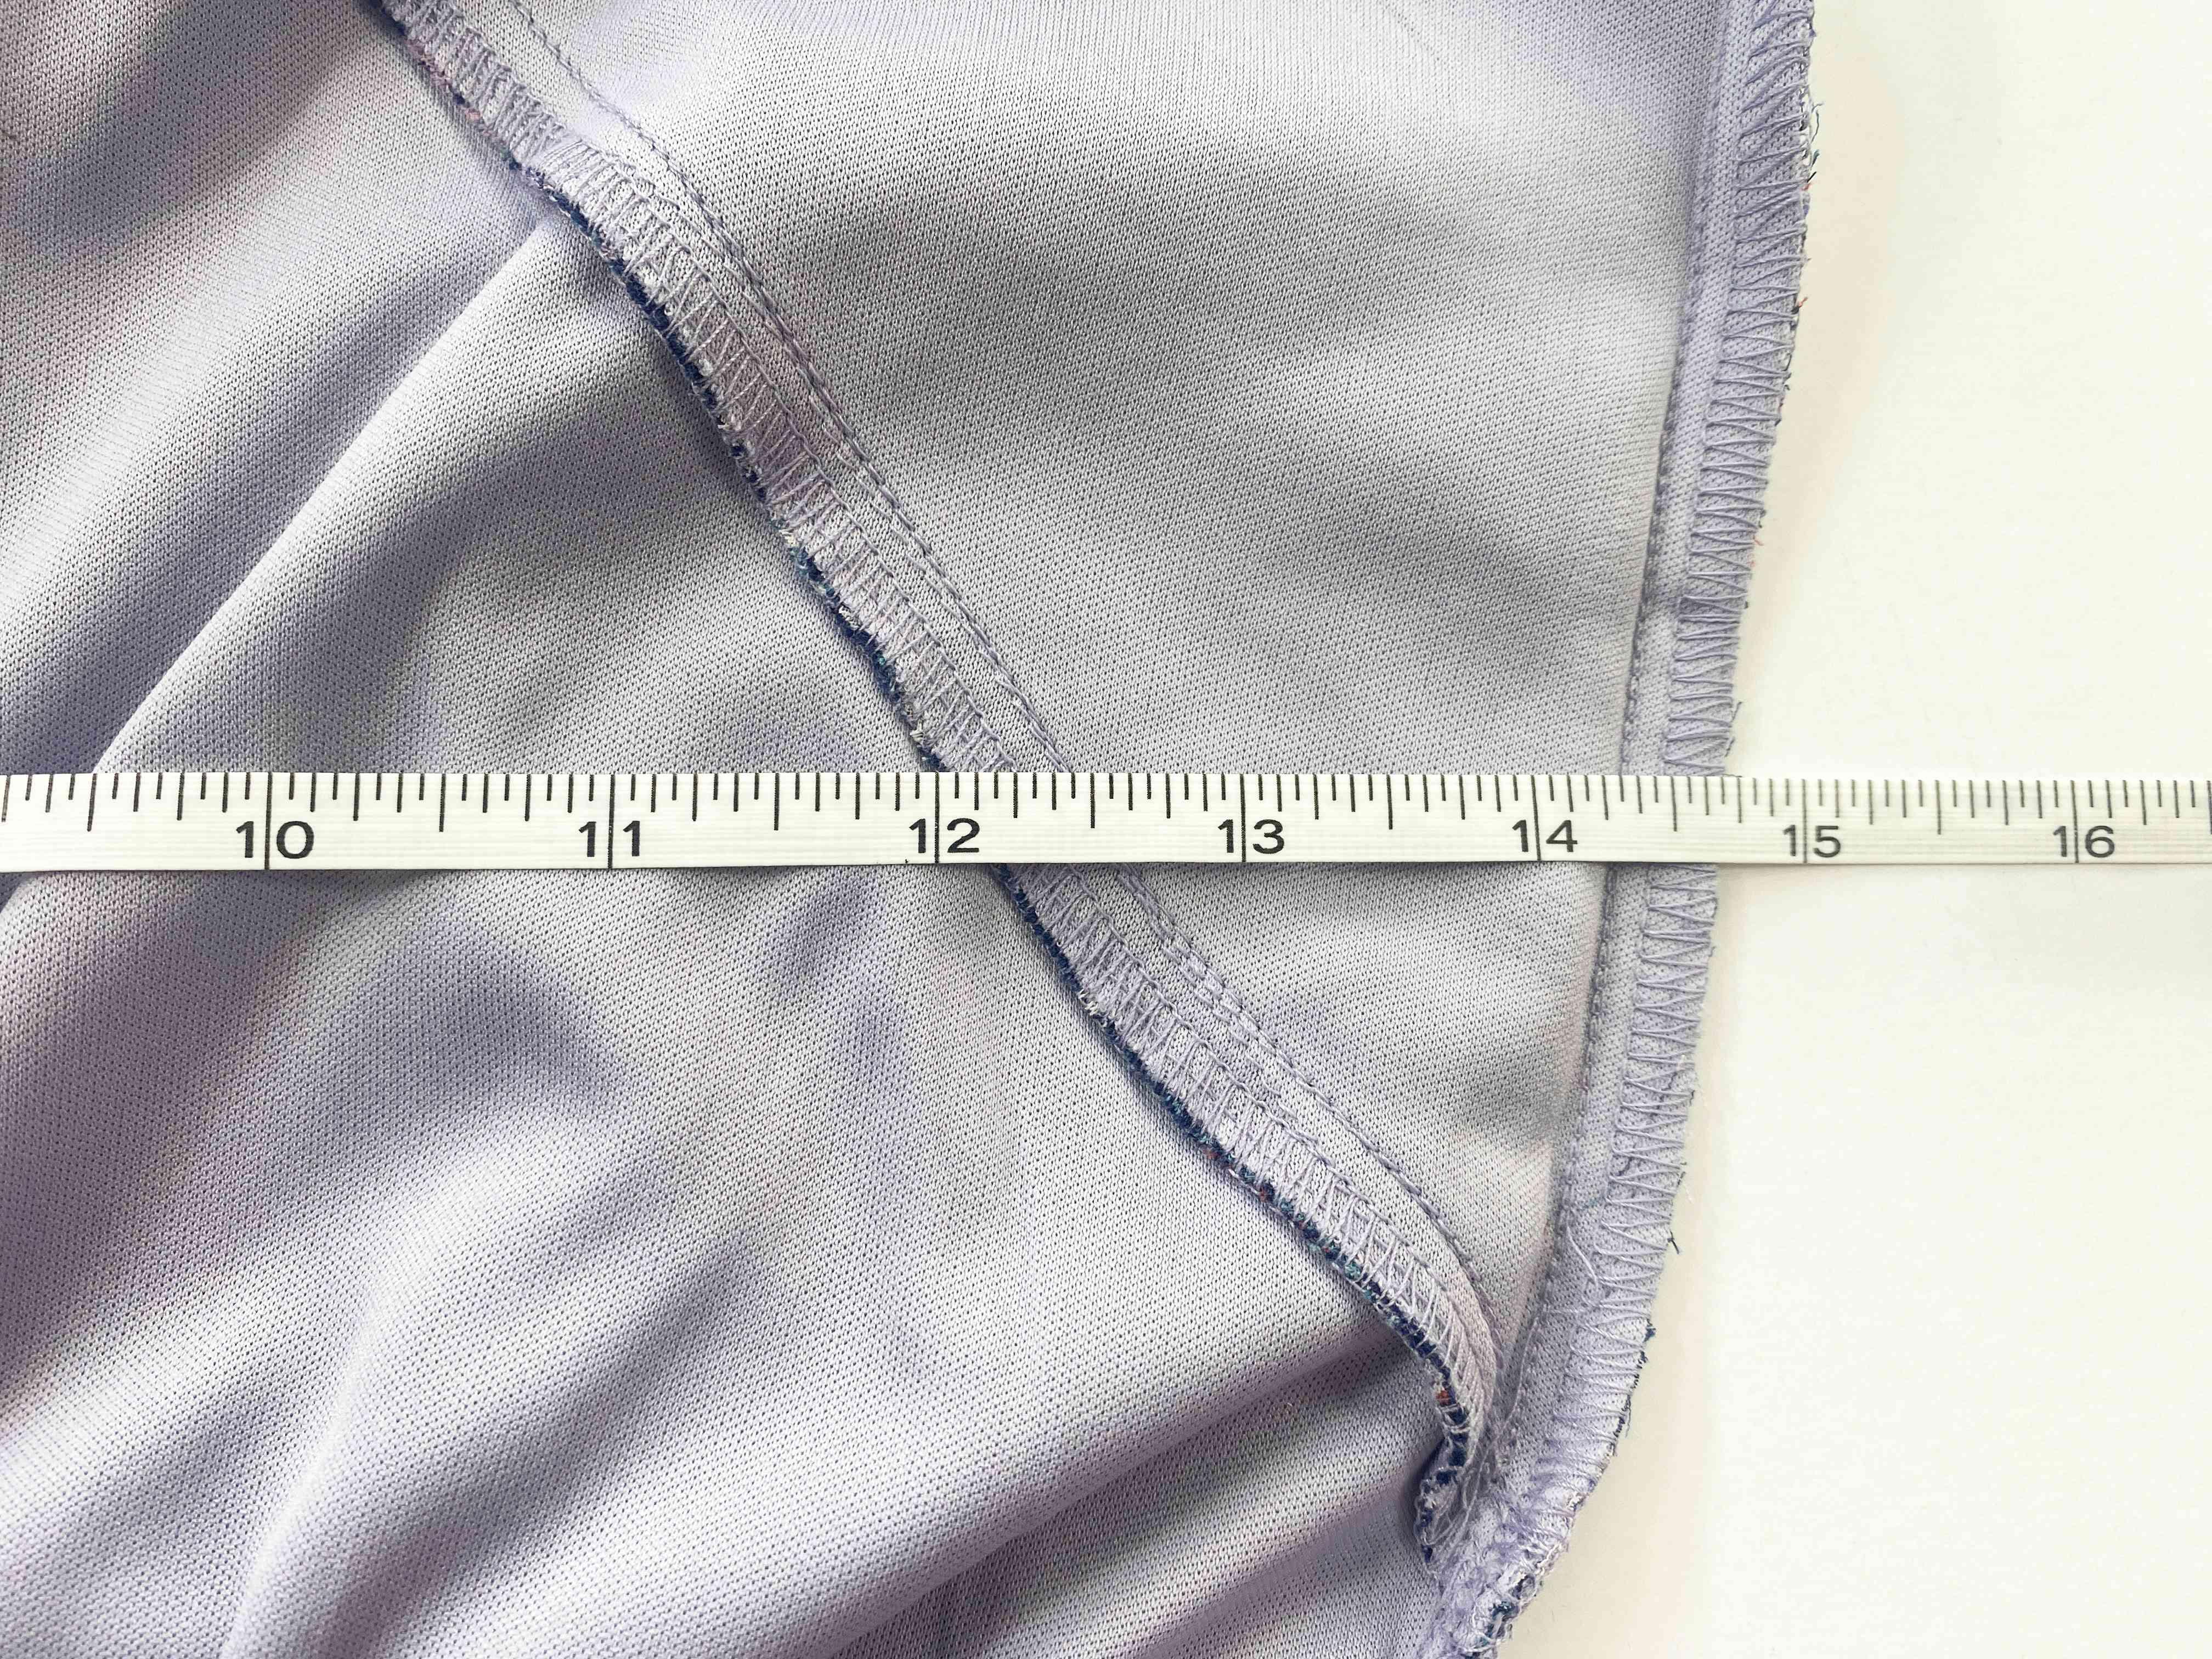 A tape measuring measuring a dress